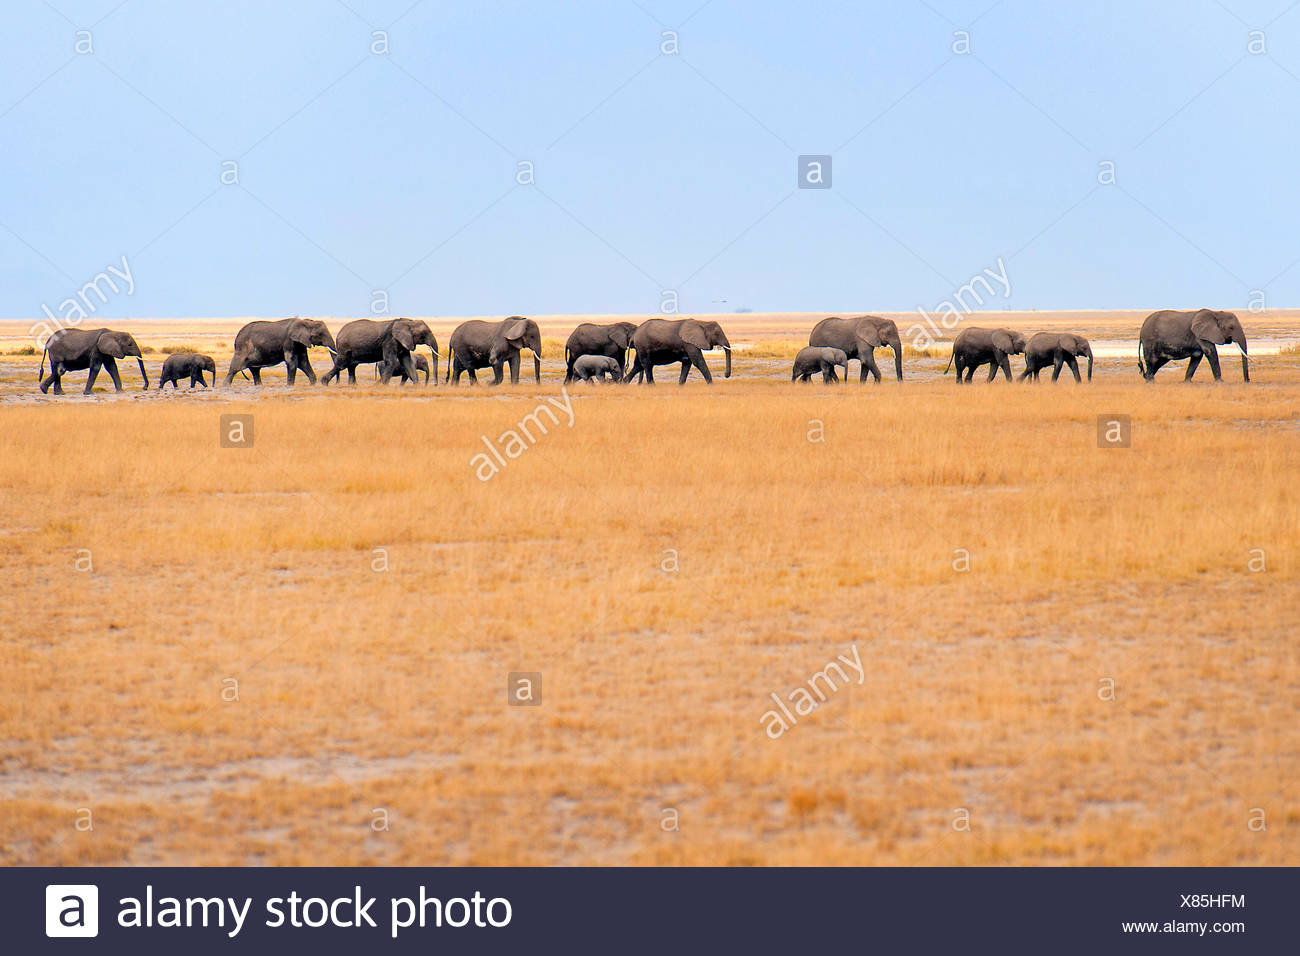 African elephant (Loxodonta africana), herd of elephants walking through the savannah, Kenya, Amboseli National Park - Stock Image